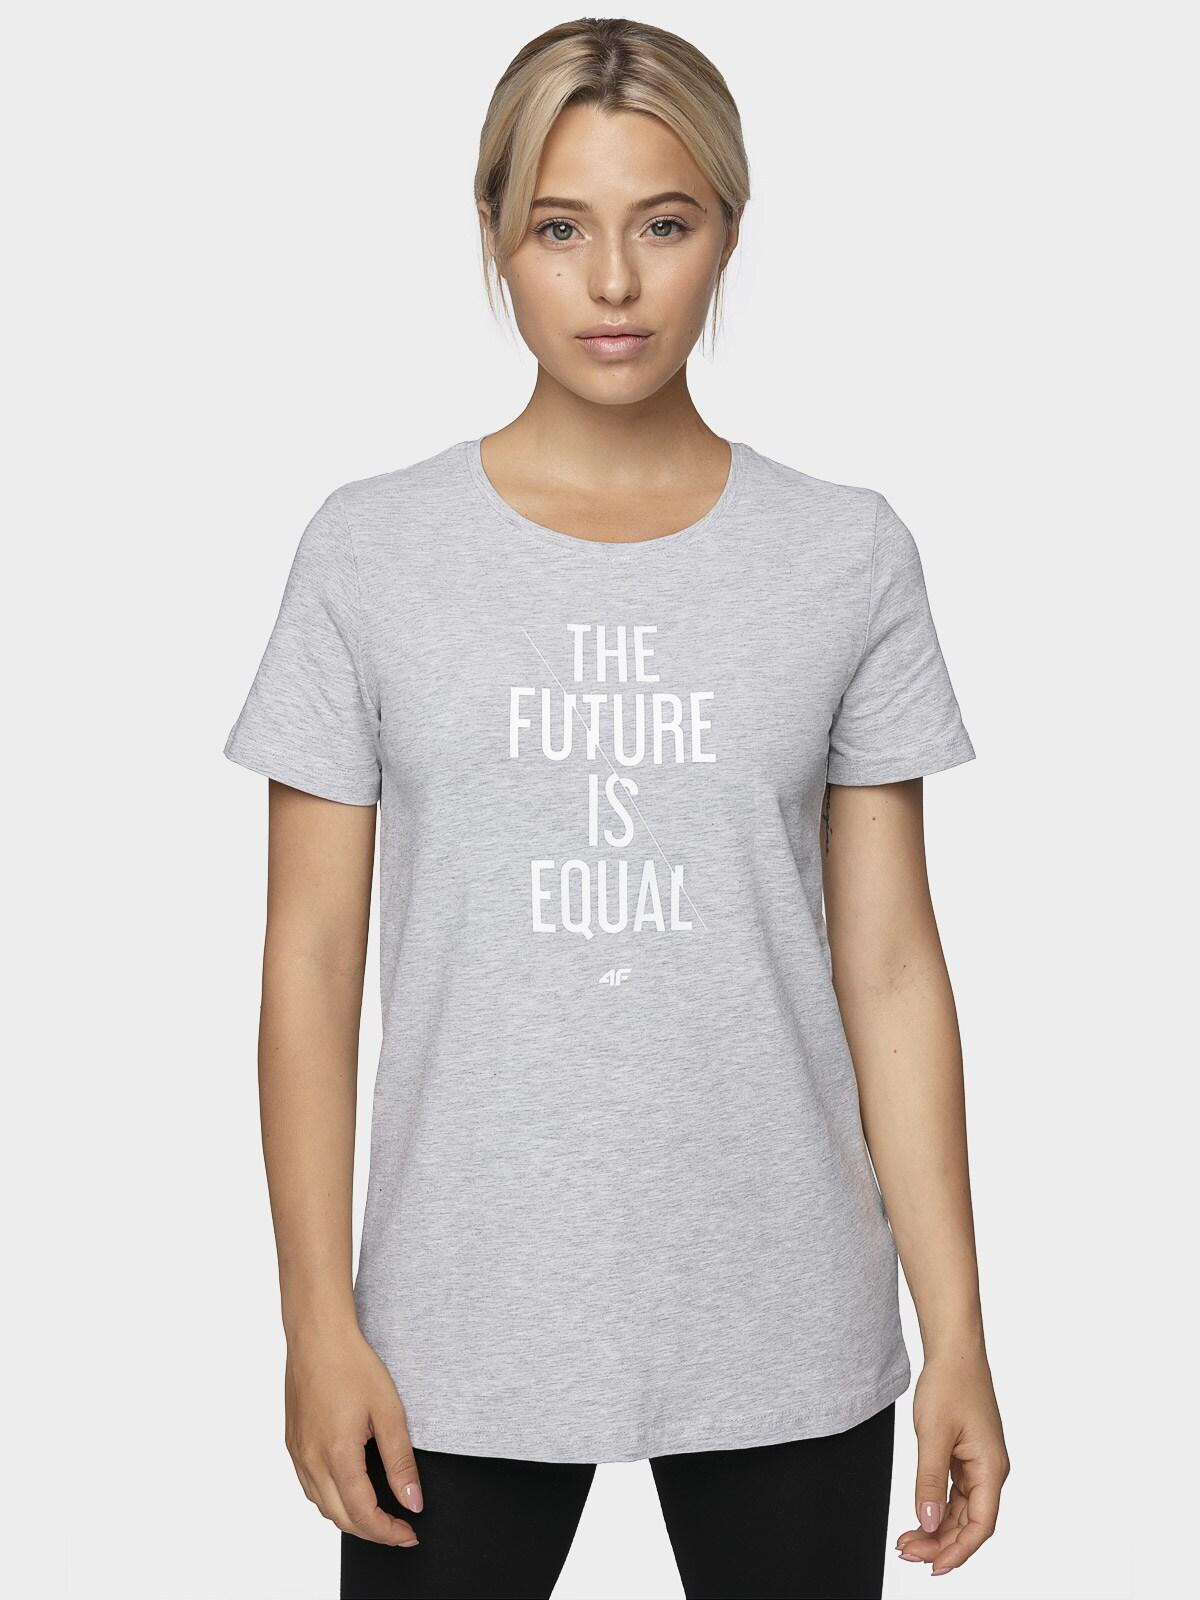 T-shirt damski TSD007 - chłodny jasny szary melanż